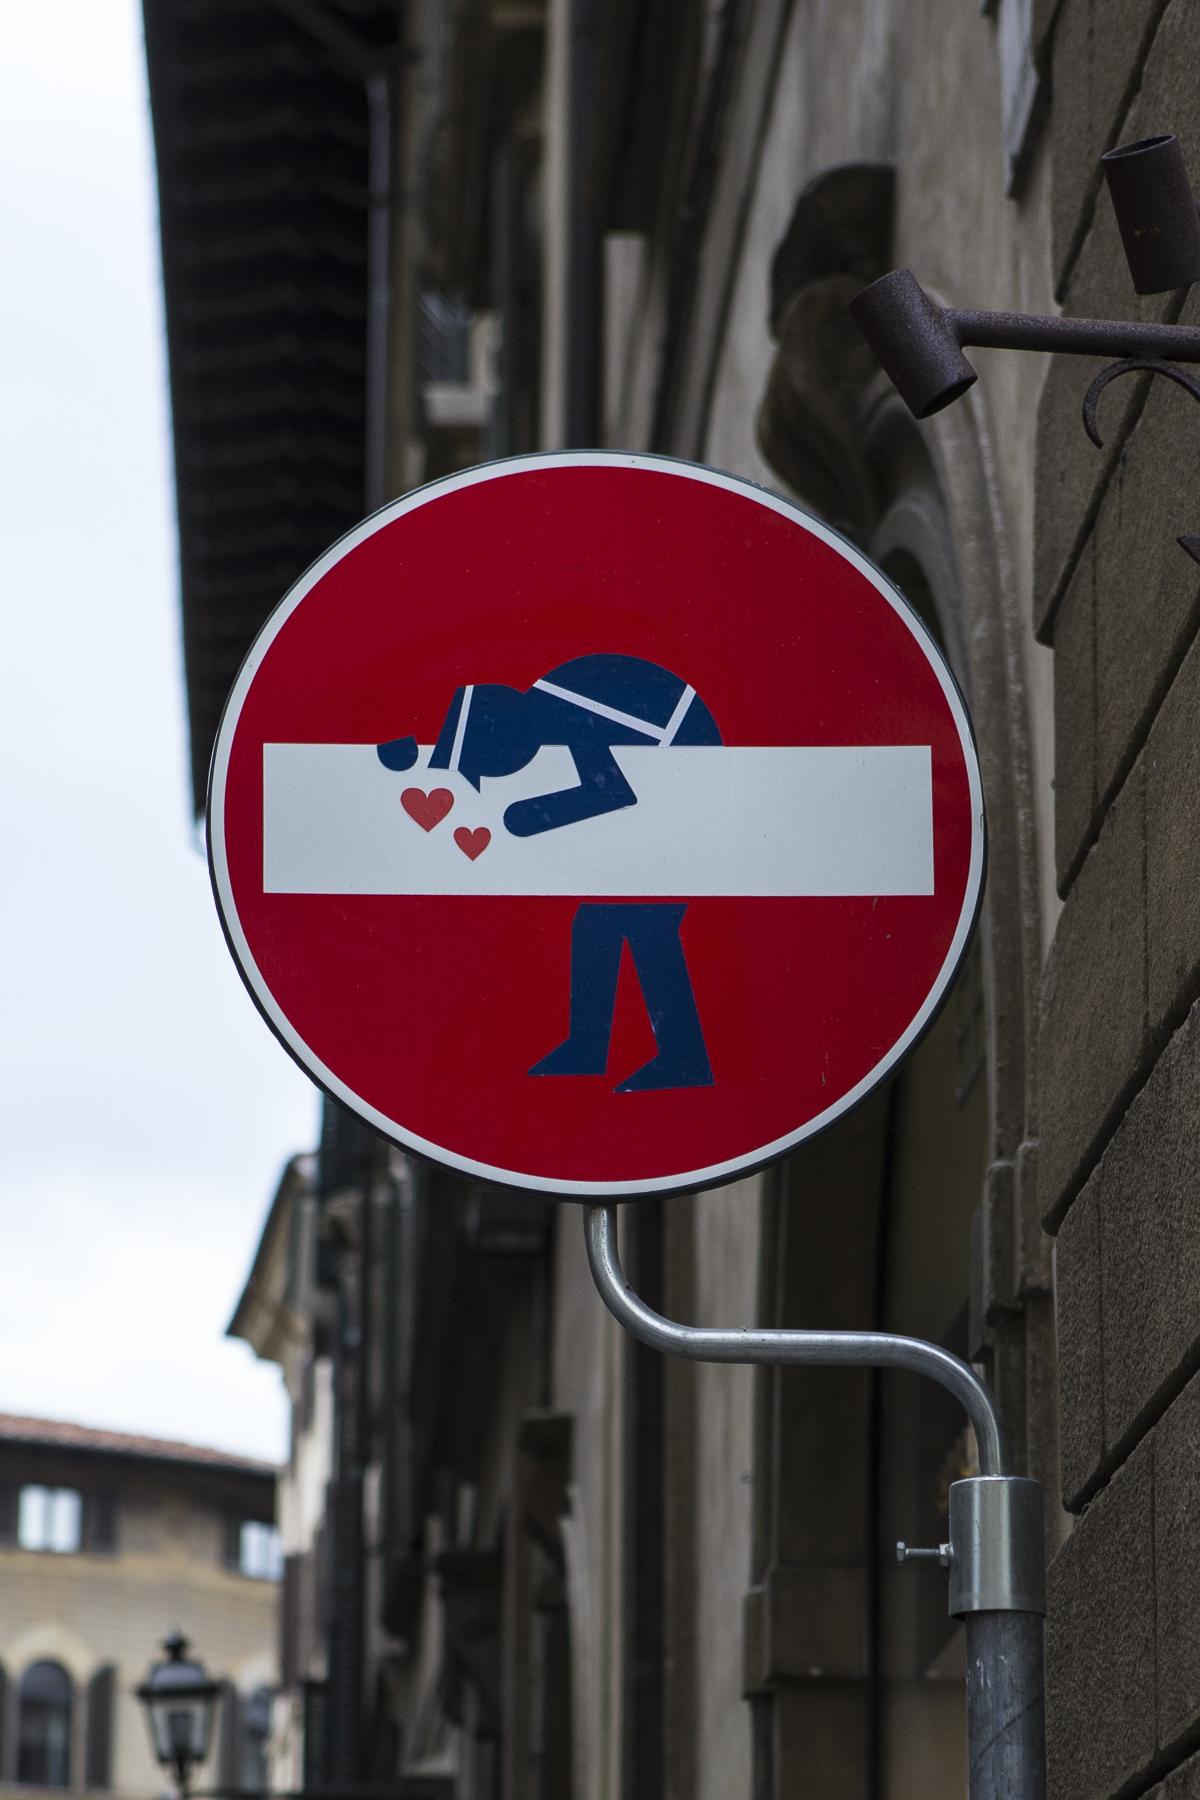 Streets of Firenze-10.jpg